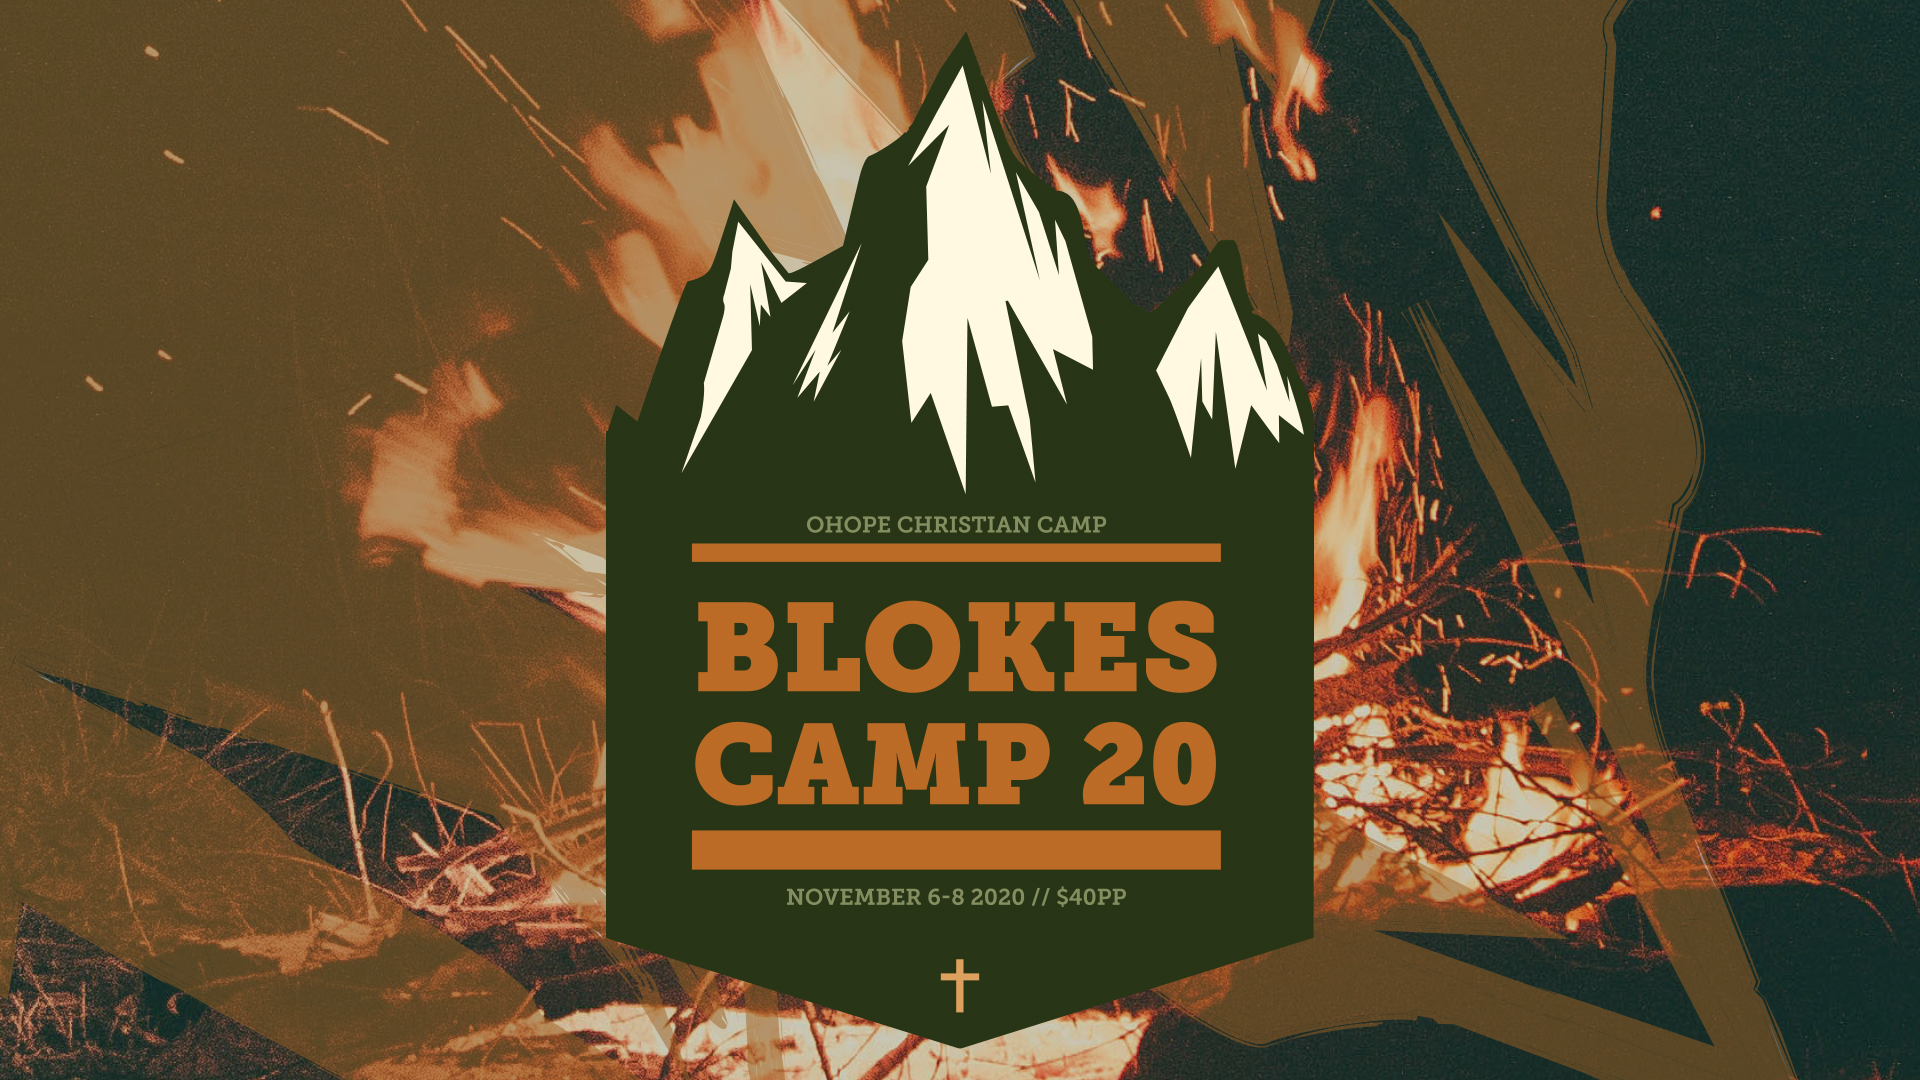 Blokes Camp 2020